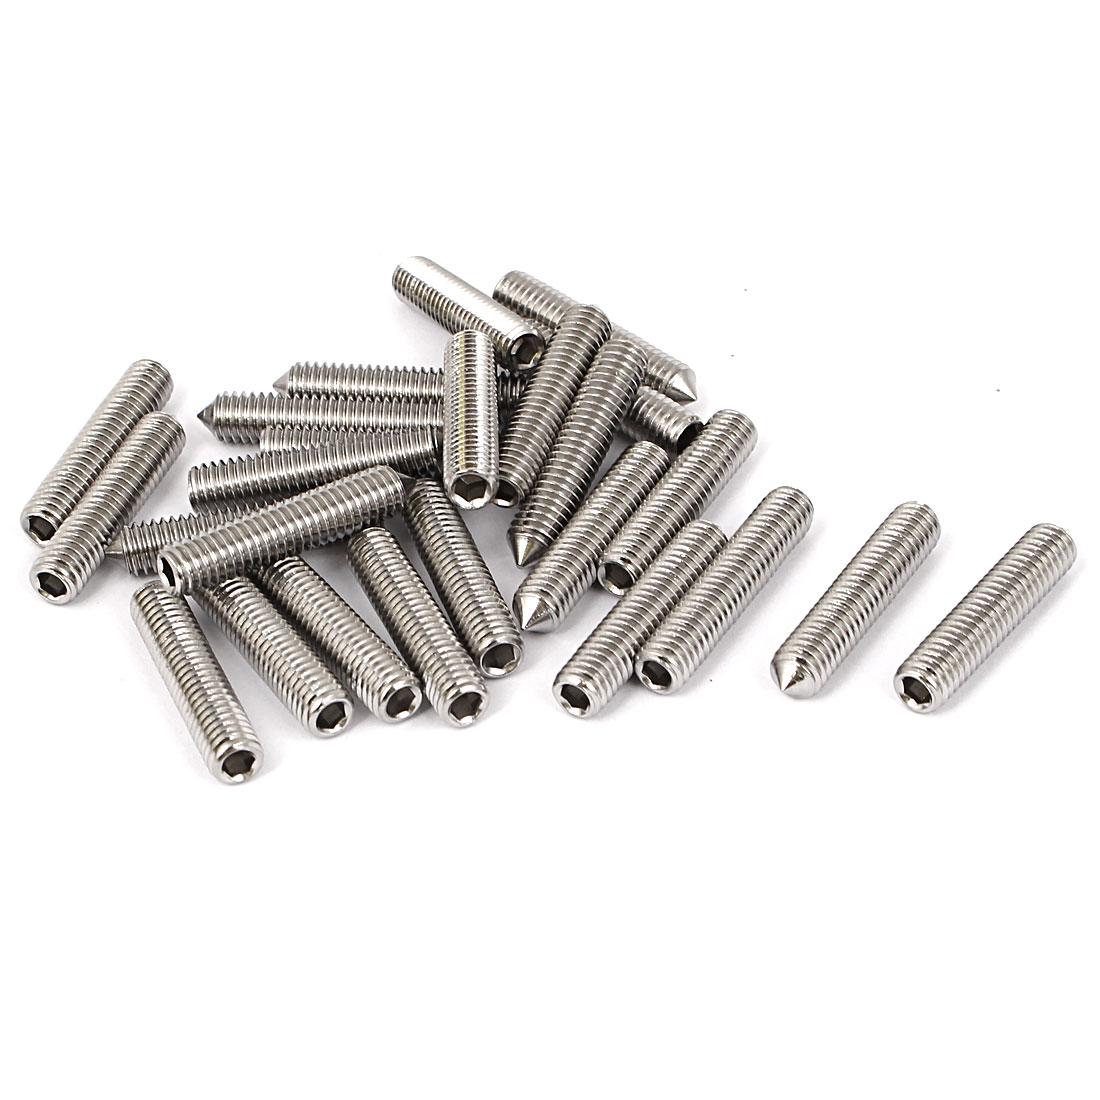 M6x30mm Stainless Steel Cone Point Grub Screws Hex Socket Set Screw 25pcs